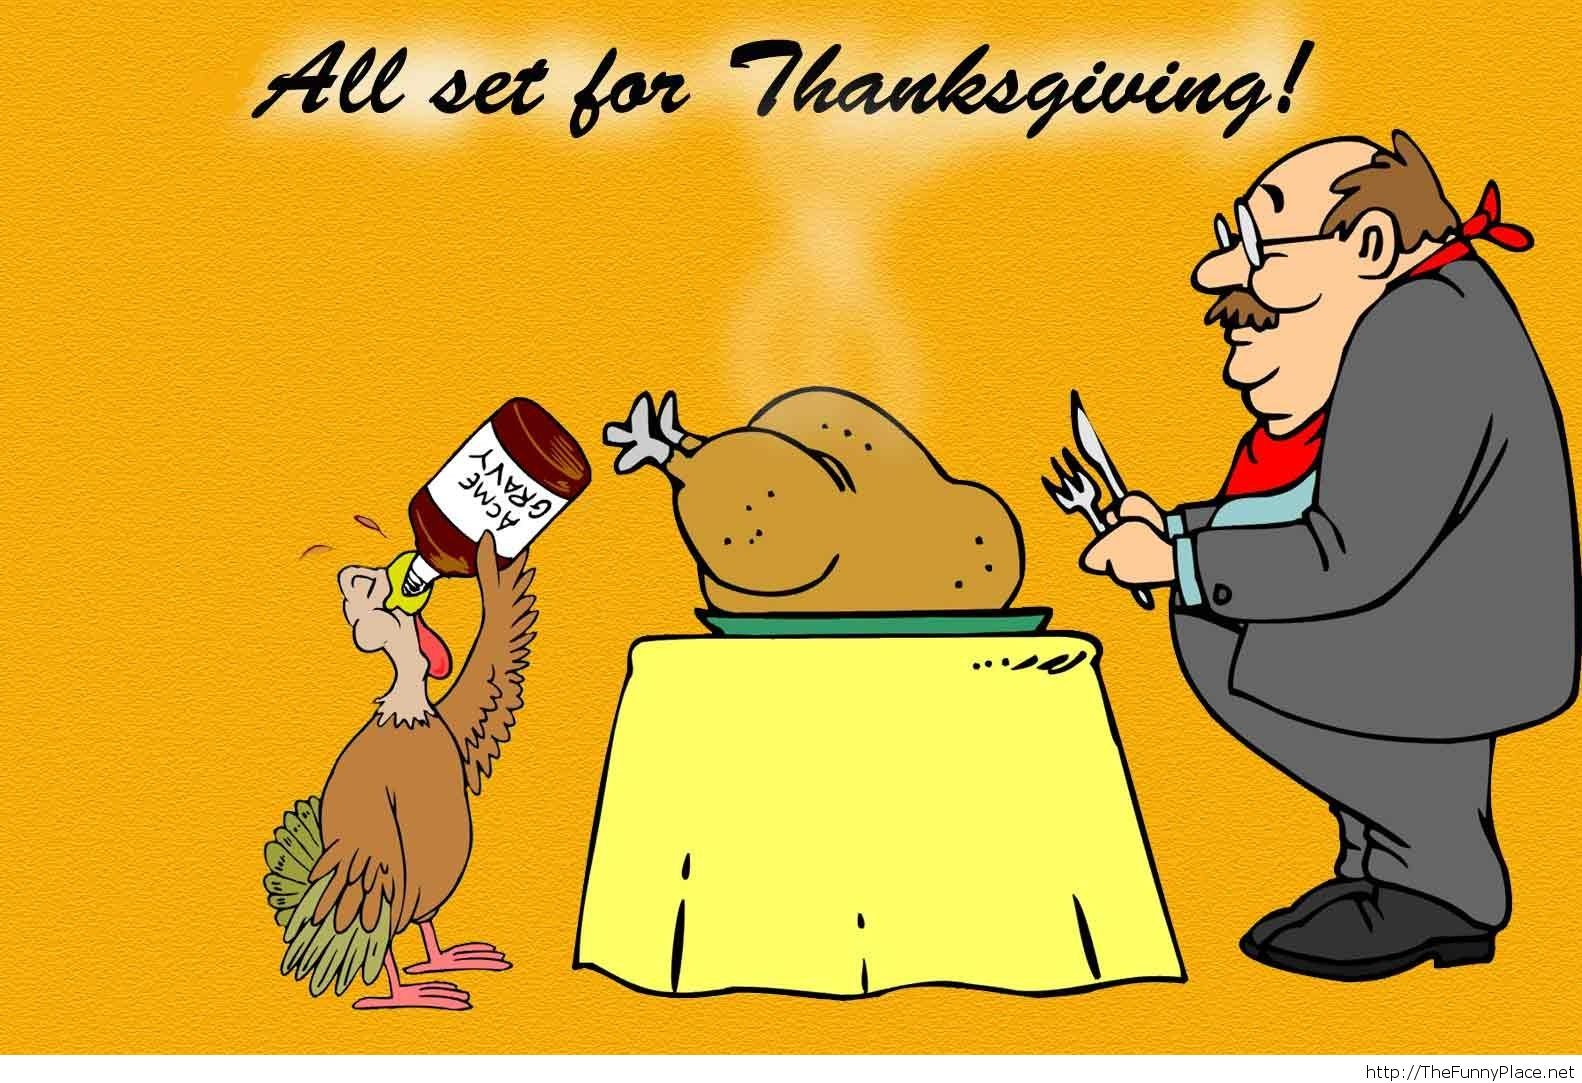 Thanksgiving funny saying